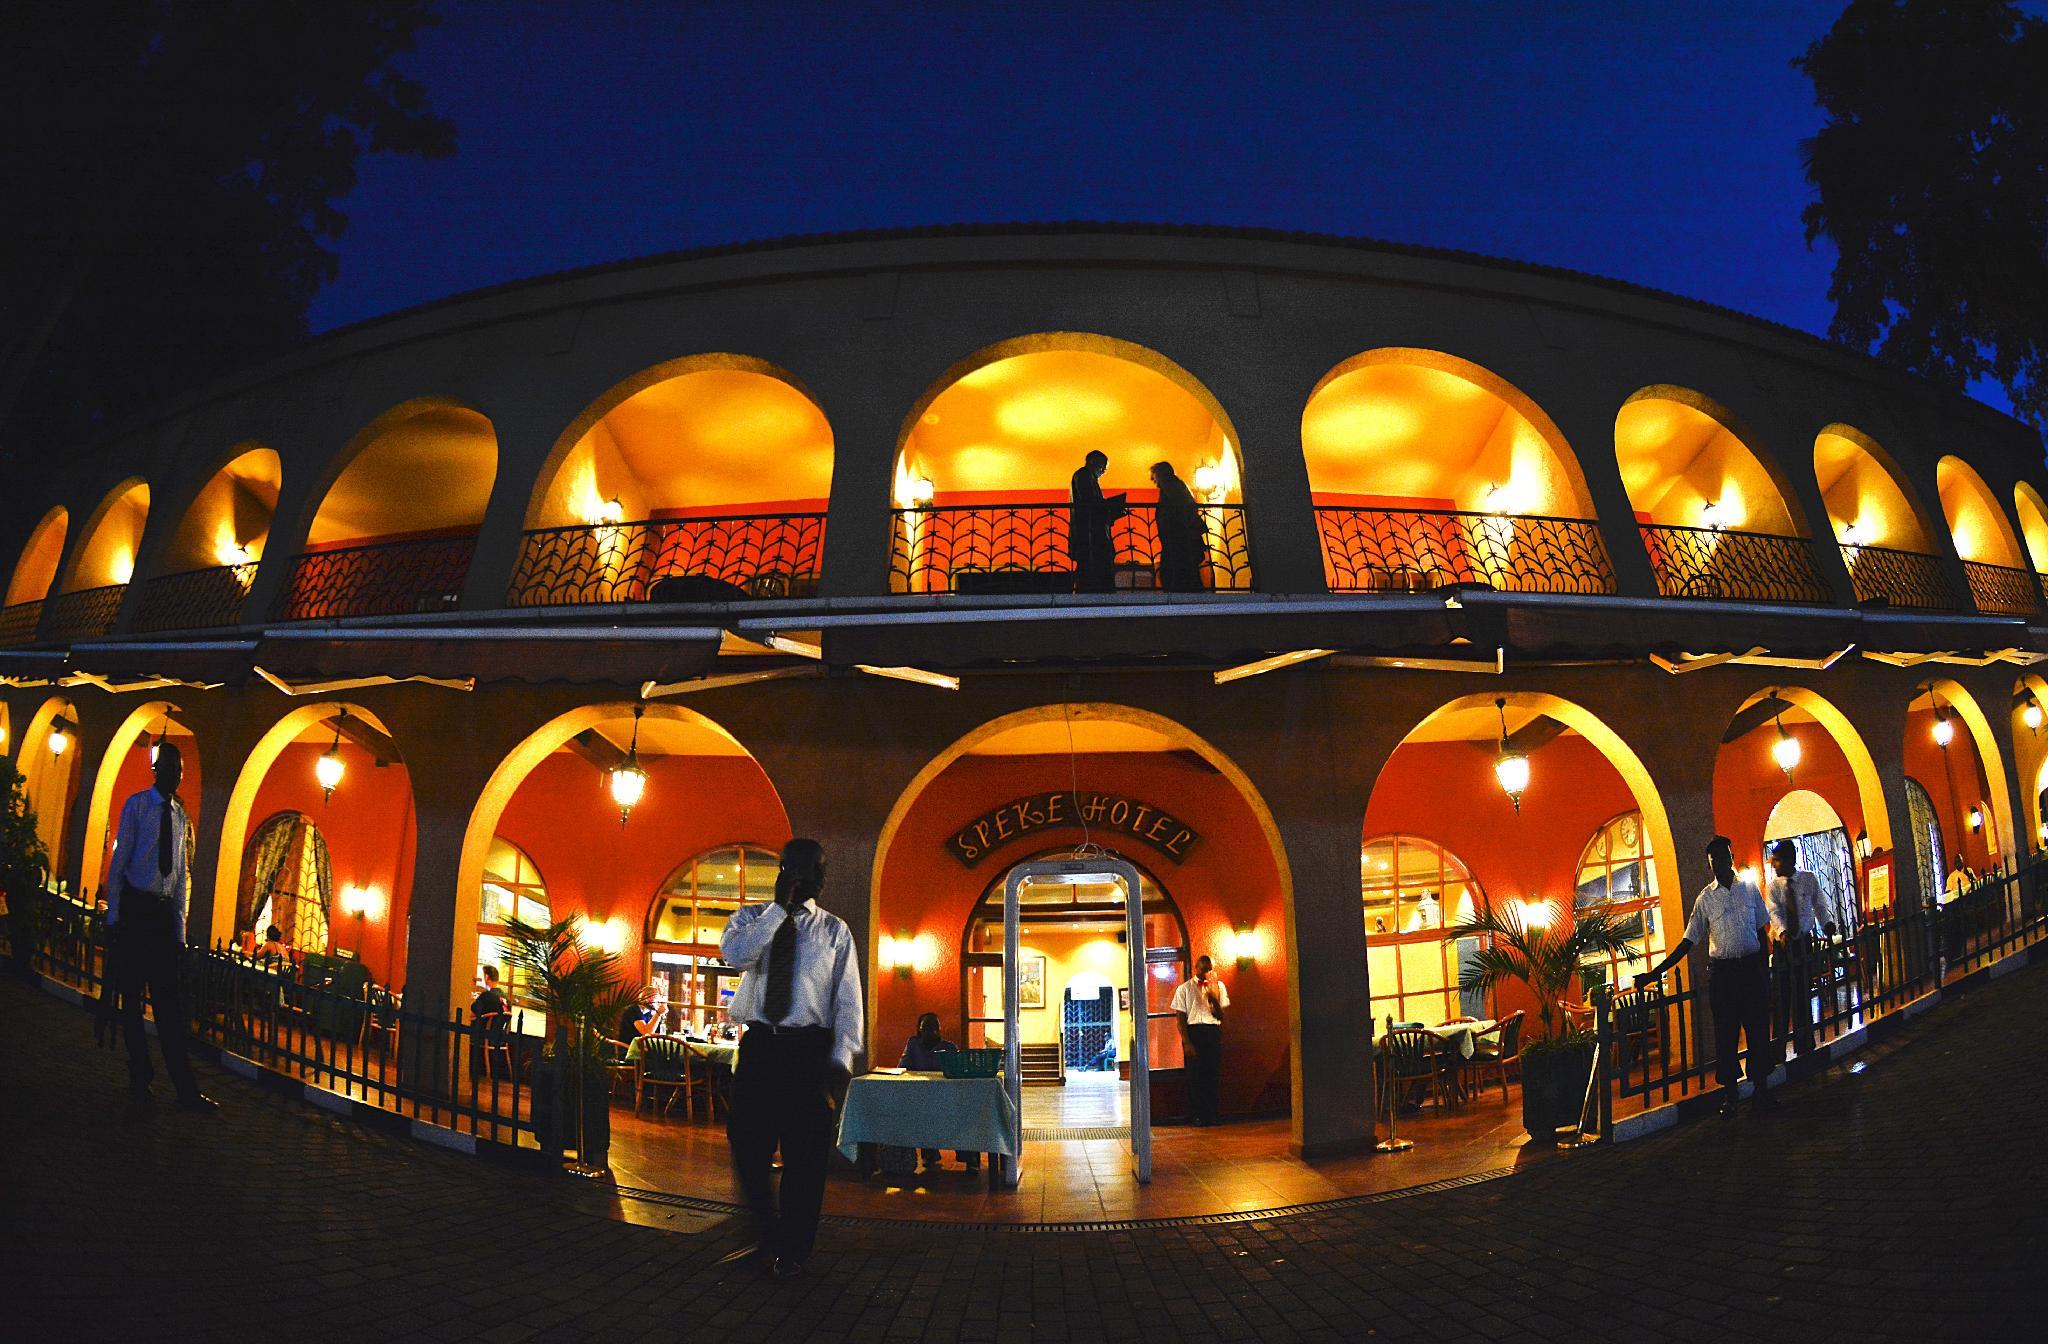 Speke Hotel 1996, Kampala